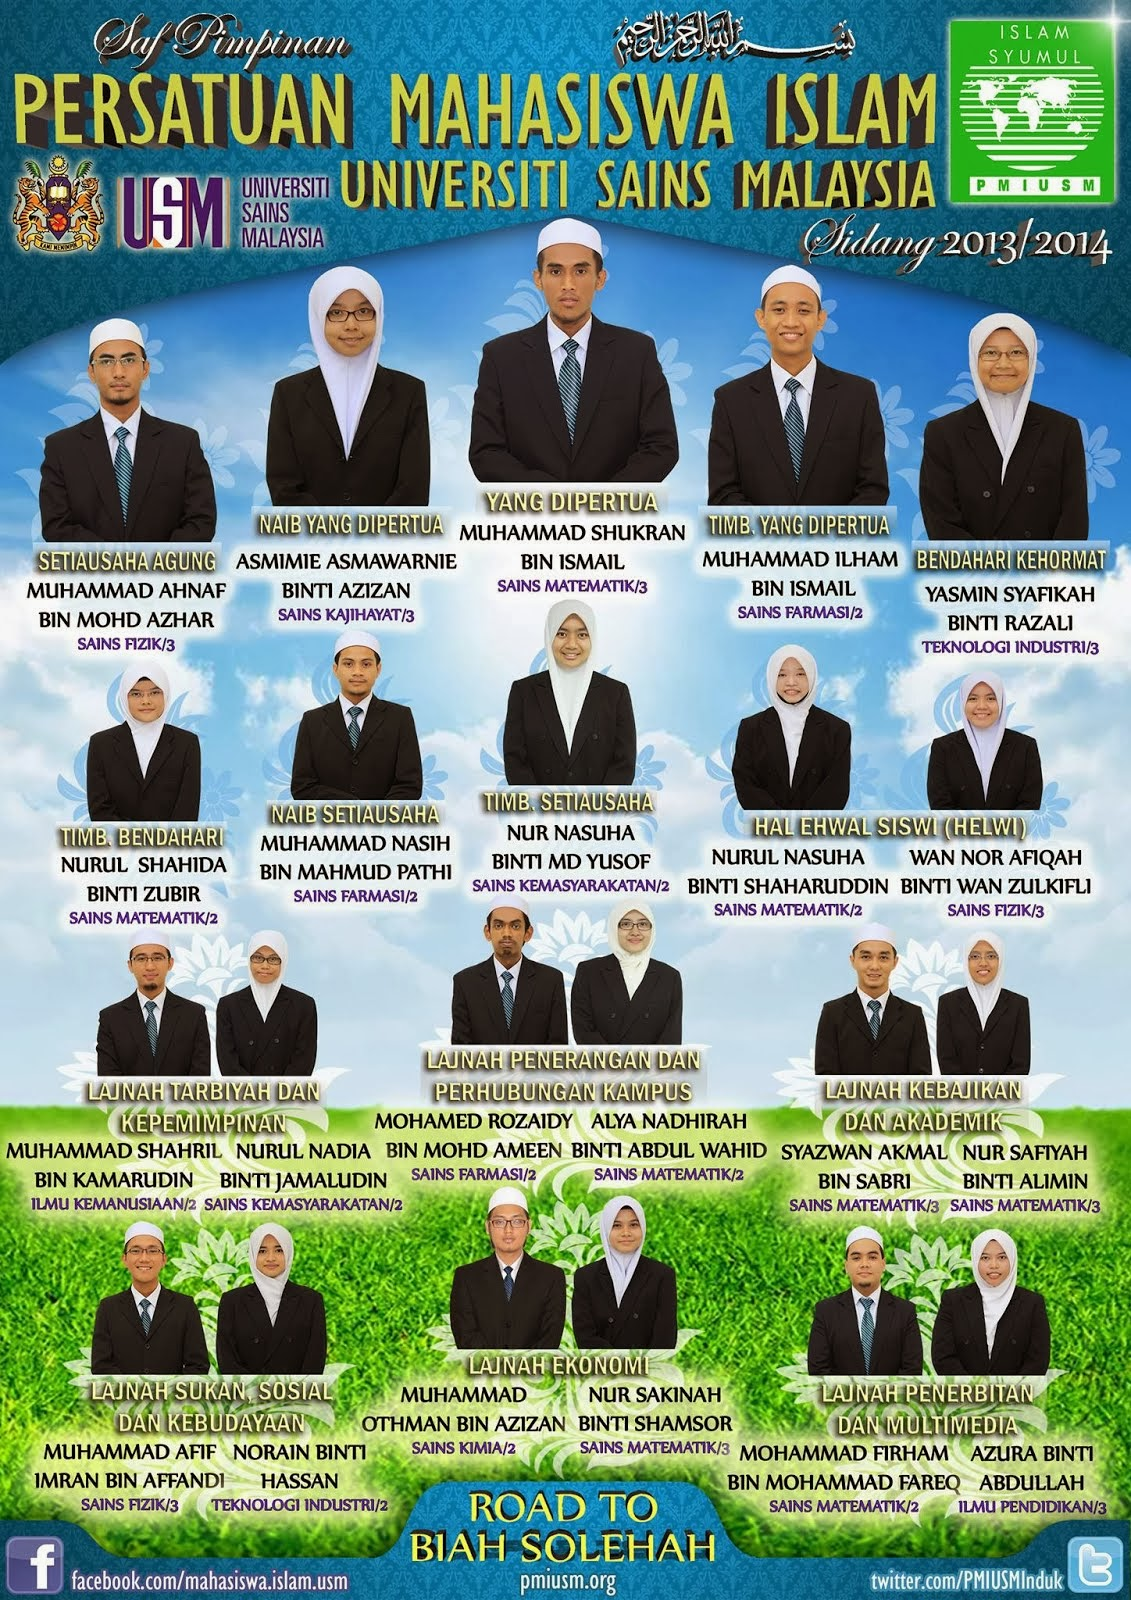 SAF PIMPINAN 2013/2014